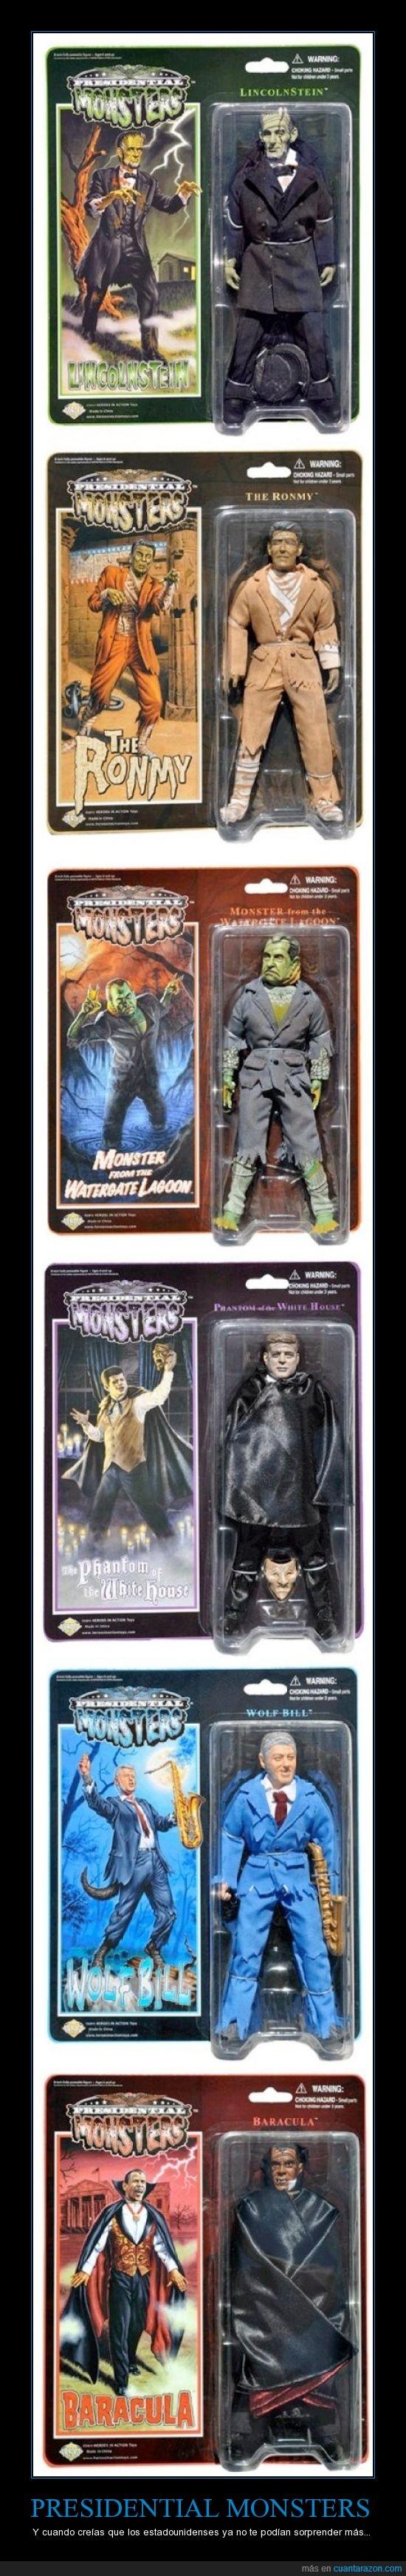 dracula,figura,jfk,juguete,monstruo,mosnter,nixon,obama